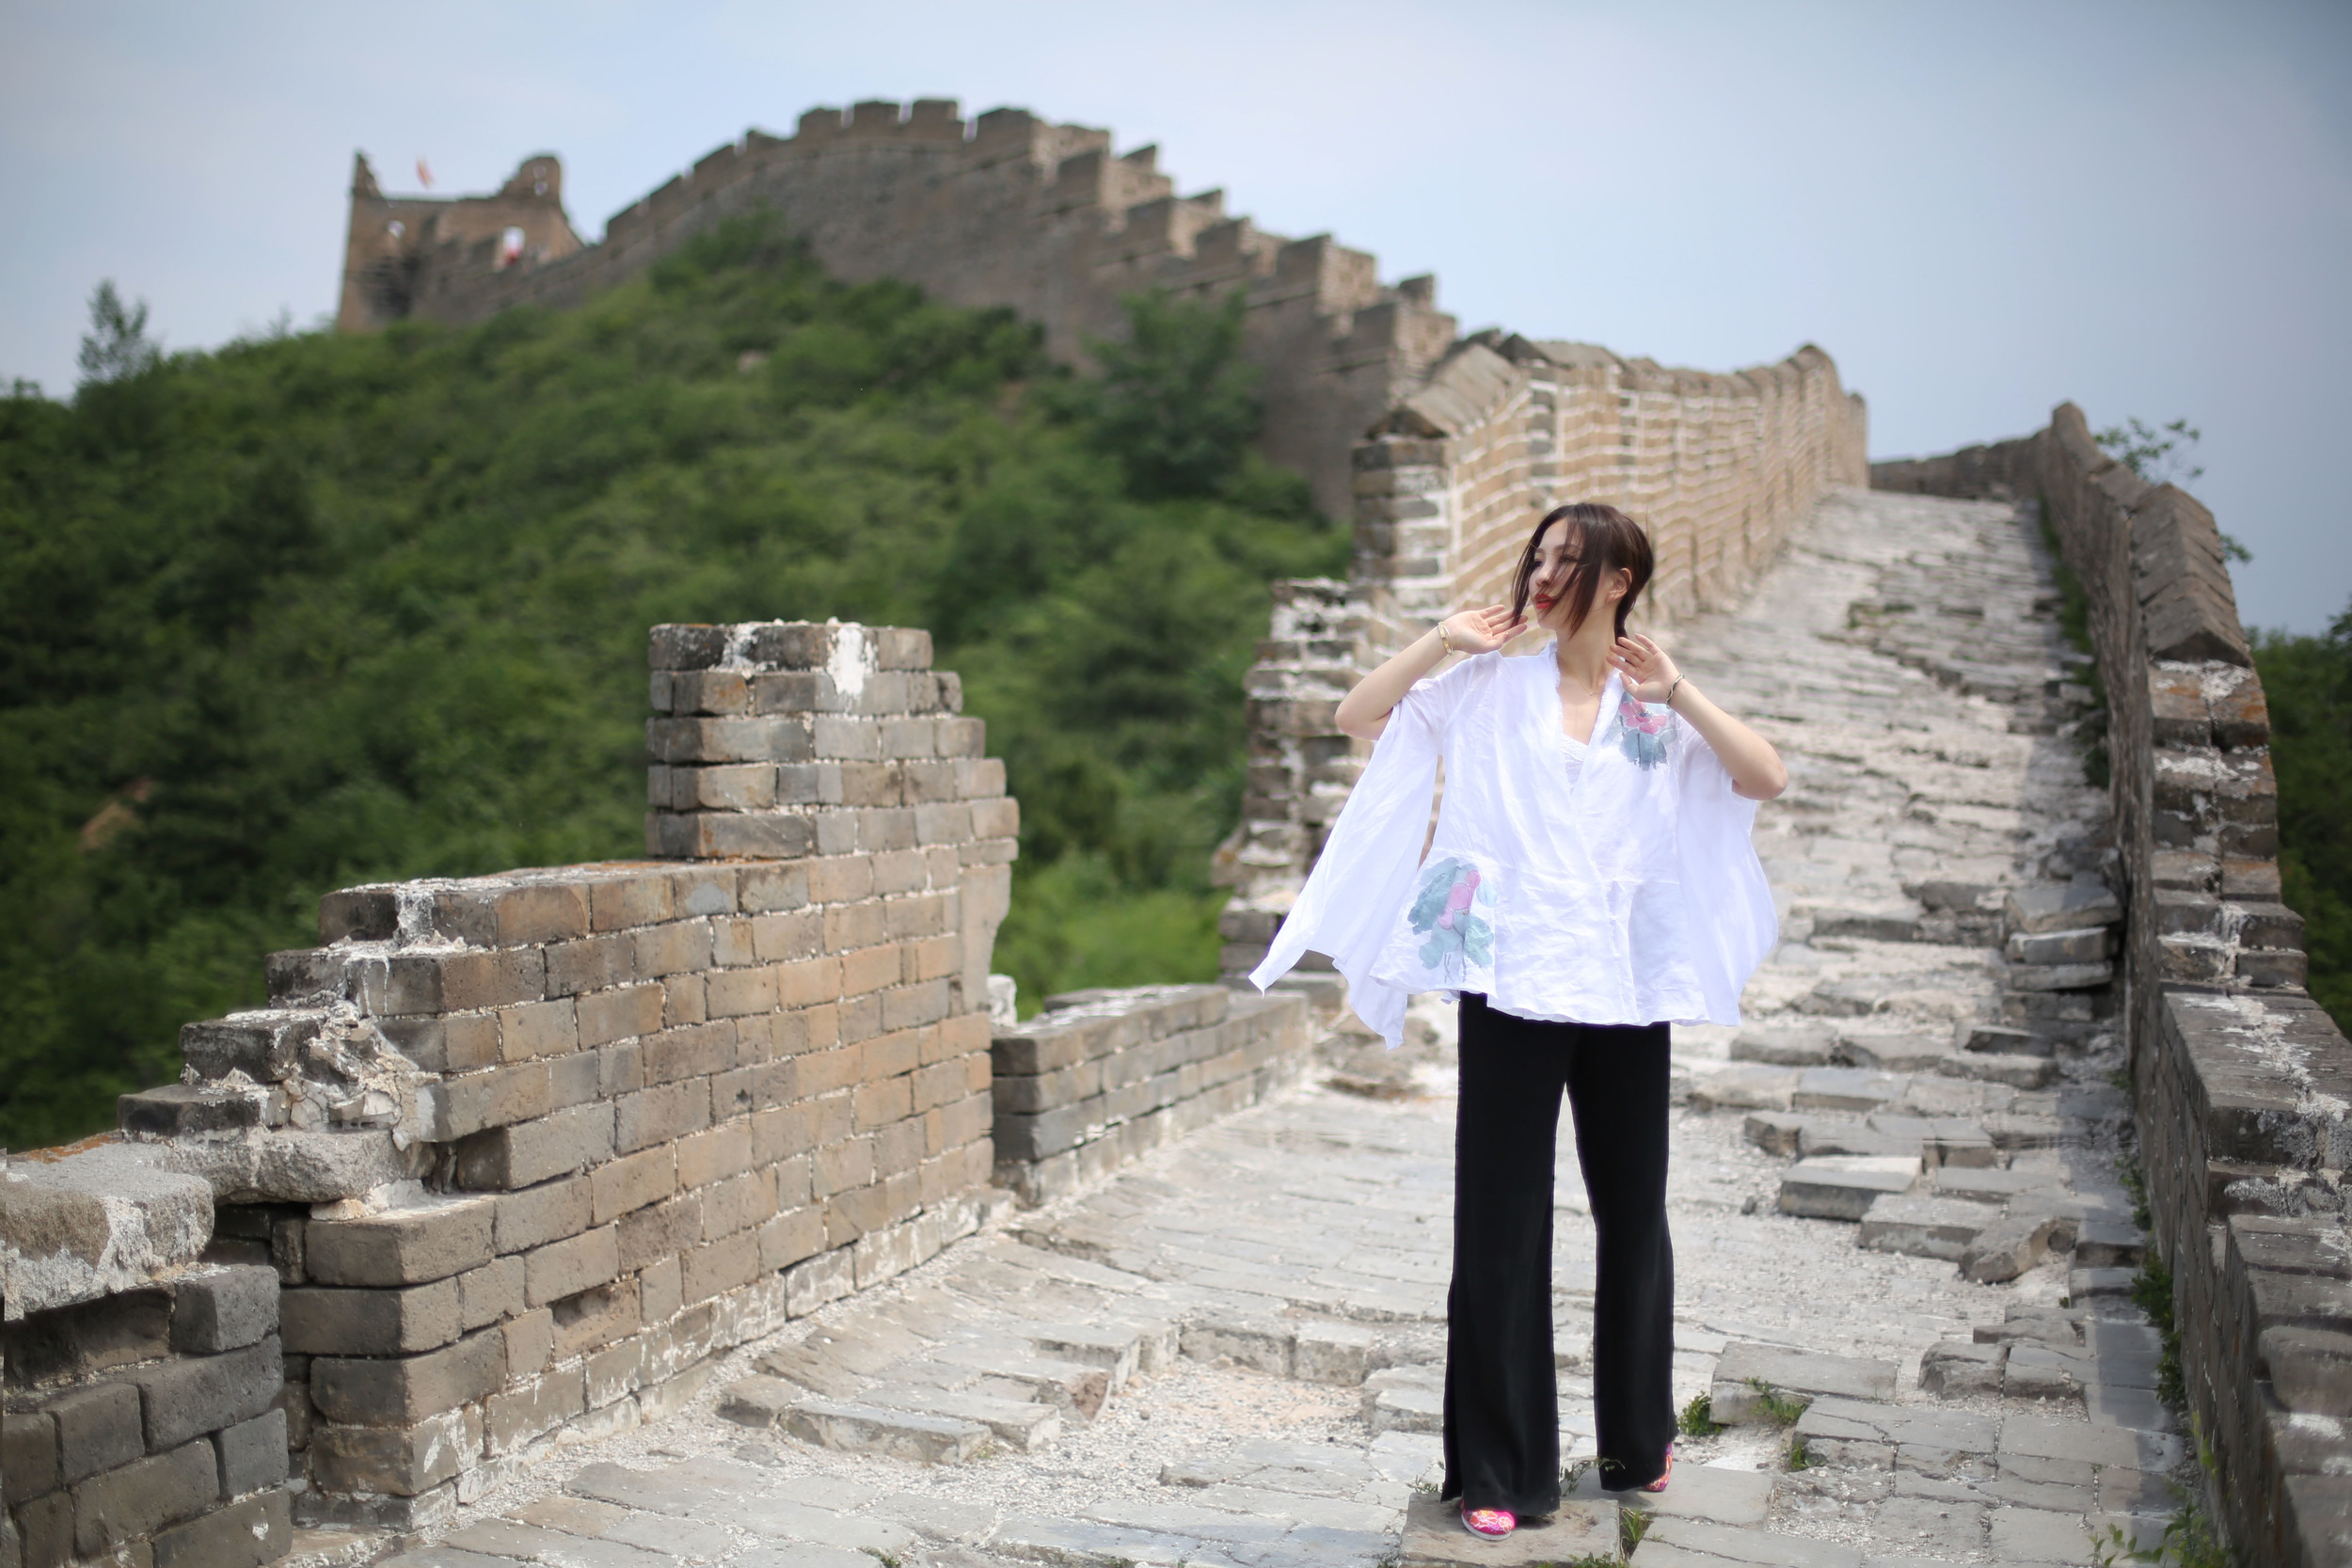 Beijing greatwall jinshanling fashion .JPG